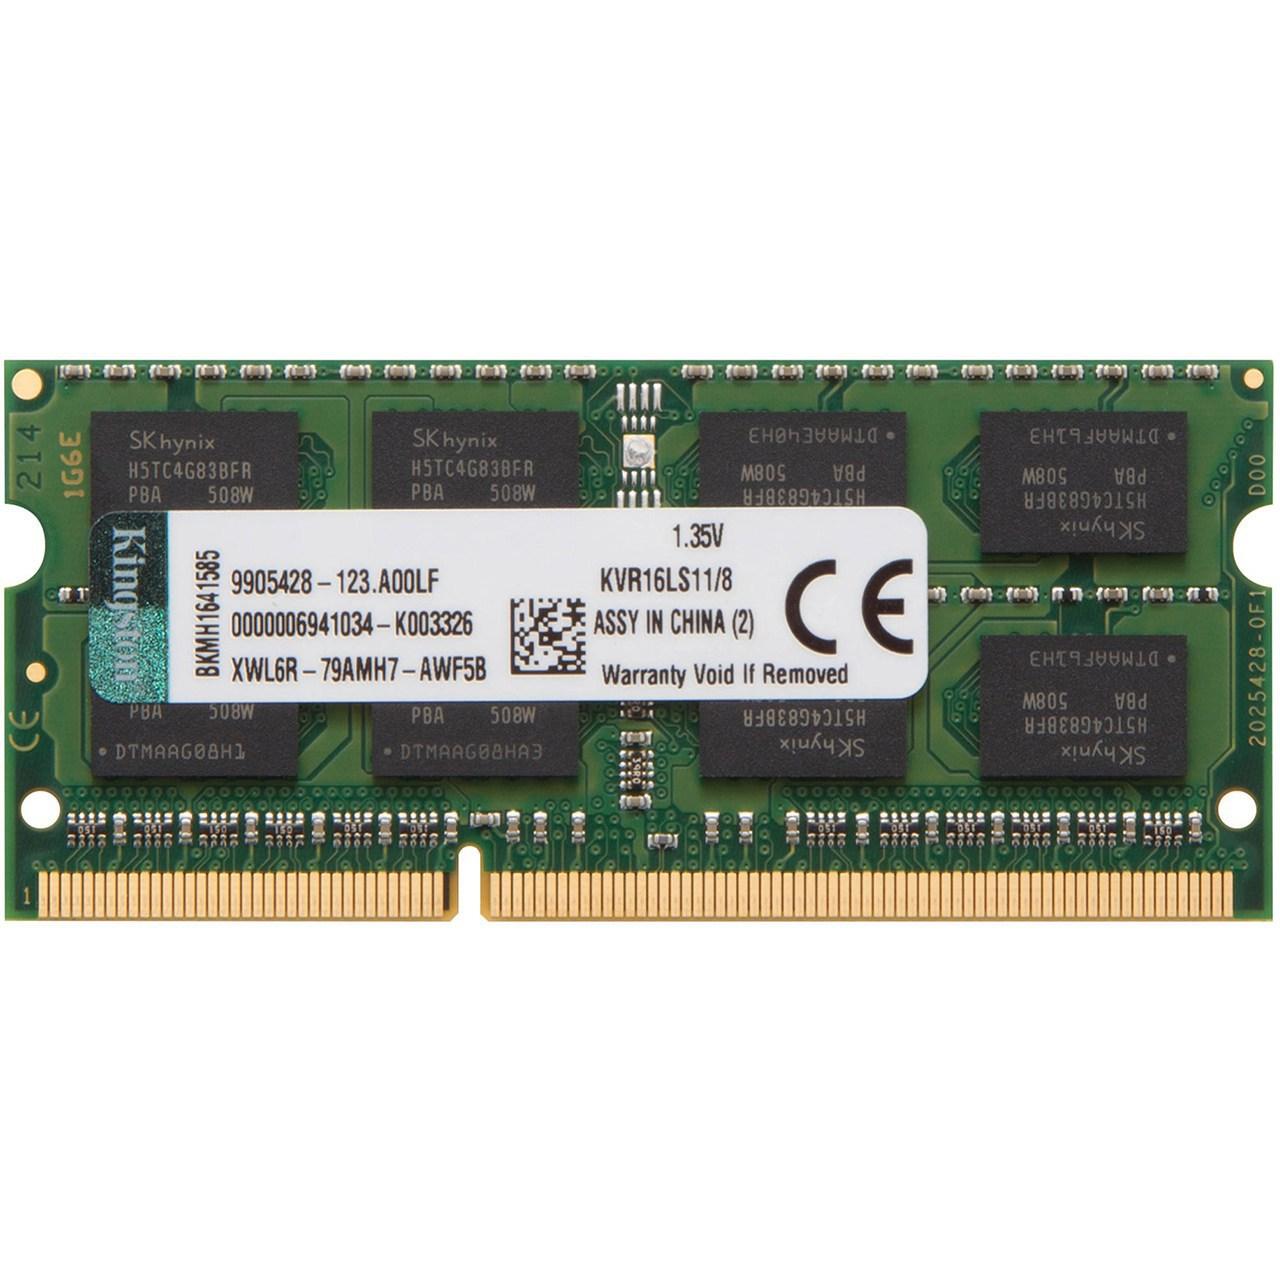 رم لپ تاپ DDR3L تک کاناله 1600 مگاهرتز CL11 کینگستون مدل ValueRAM ظرفیت 8 گیگابایت